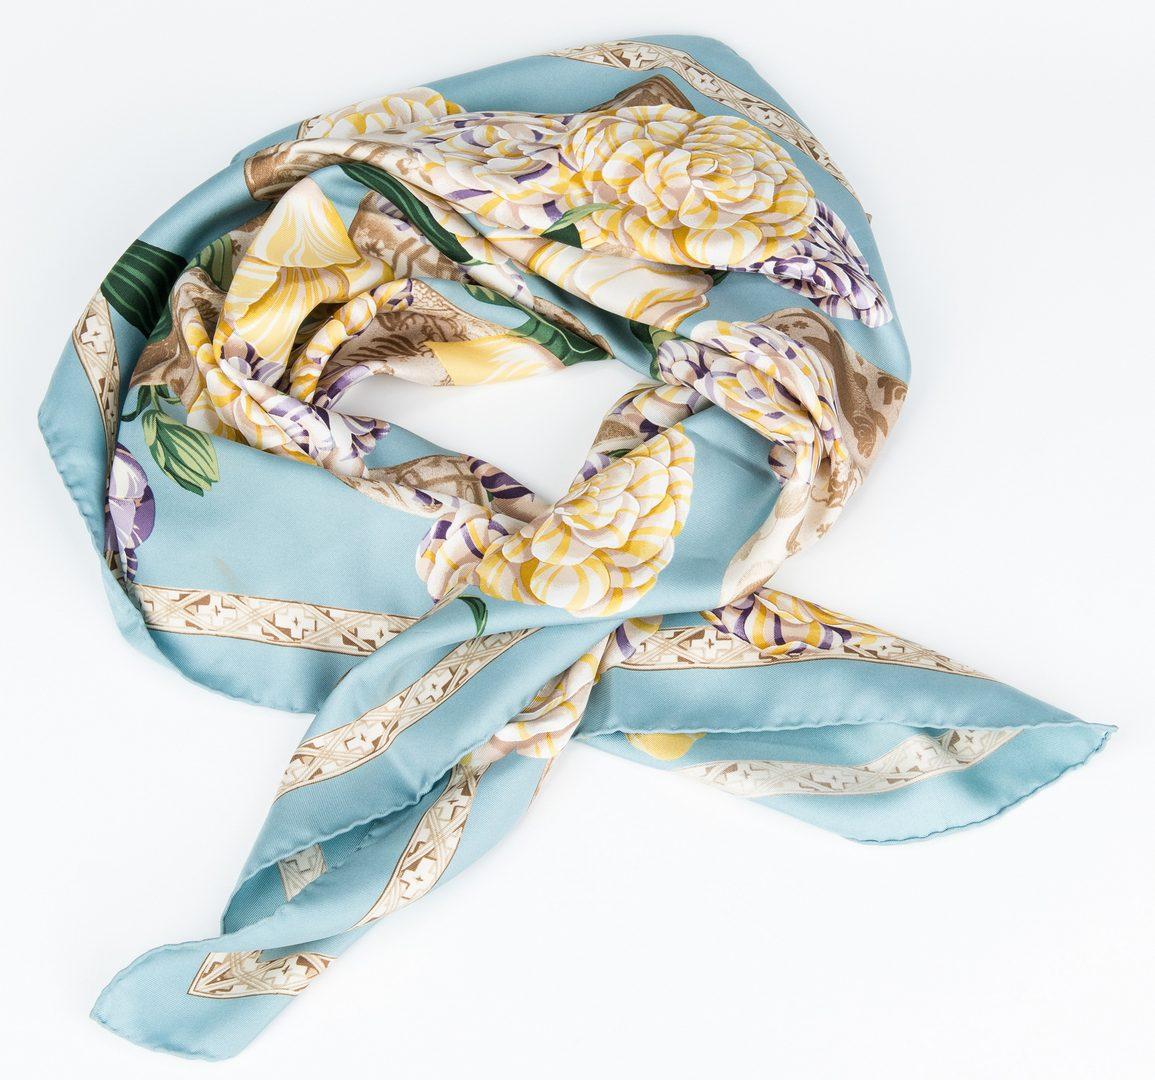 Lot 427: 4 Fashion Scarves, incl. Gucci, Eskandar, Moschino